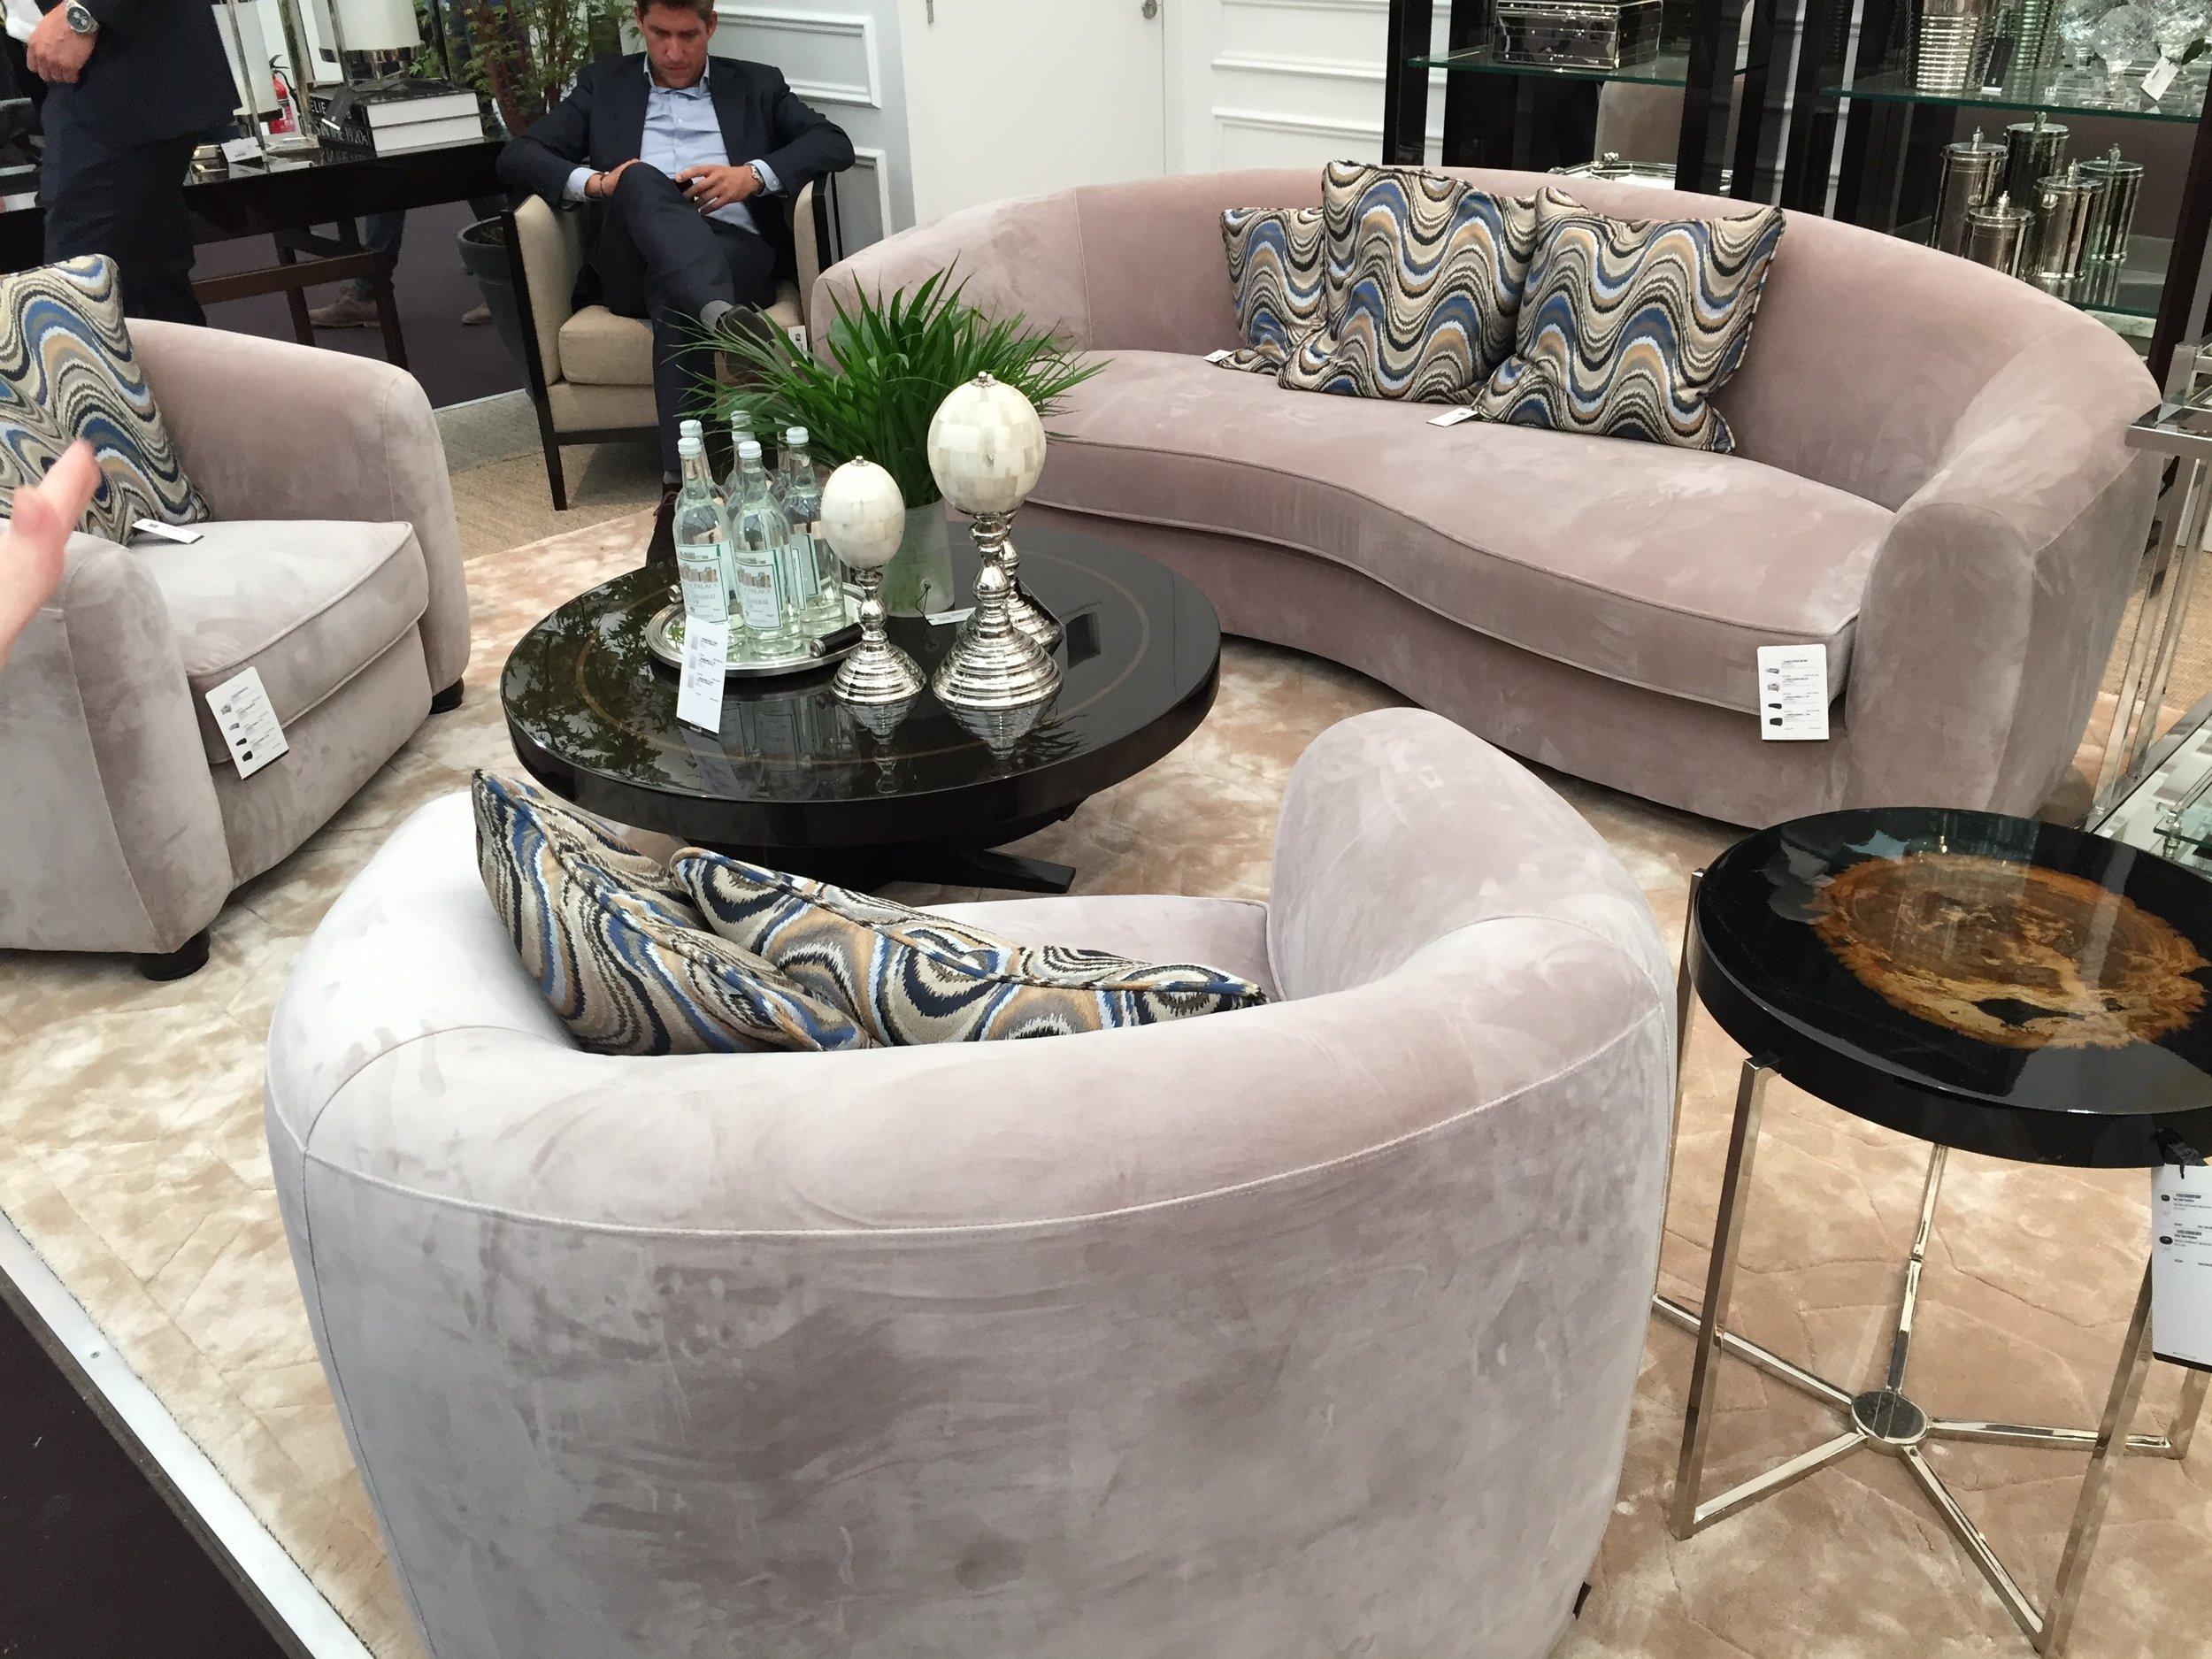 Decorex 2016 - Curved upholstered sofa in pale pink | Masha Shapiro Agency.JPG